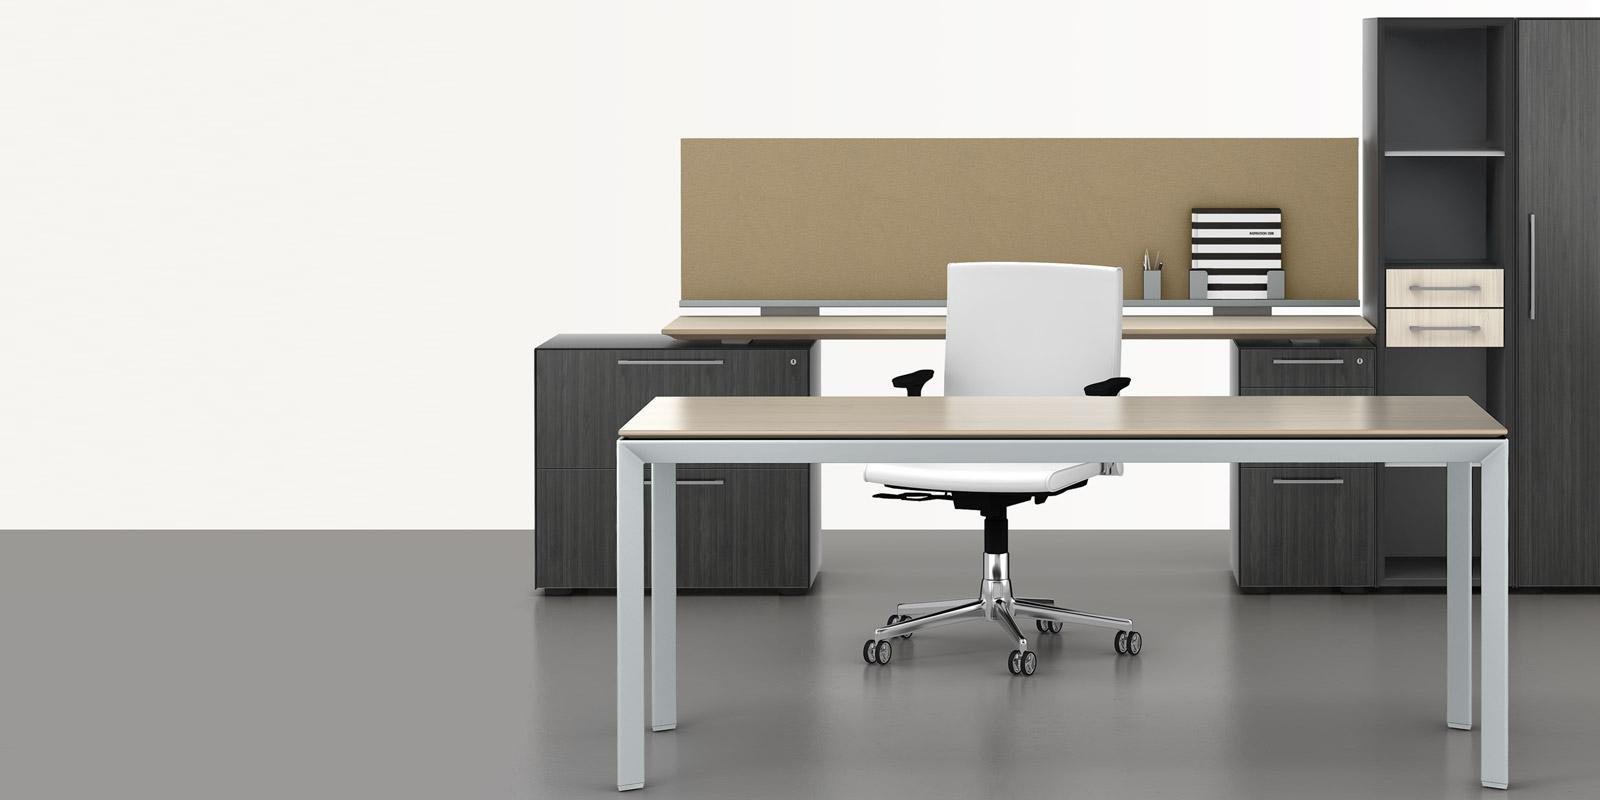 Miro-Desks_035.jpg